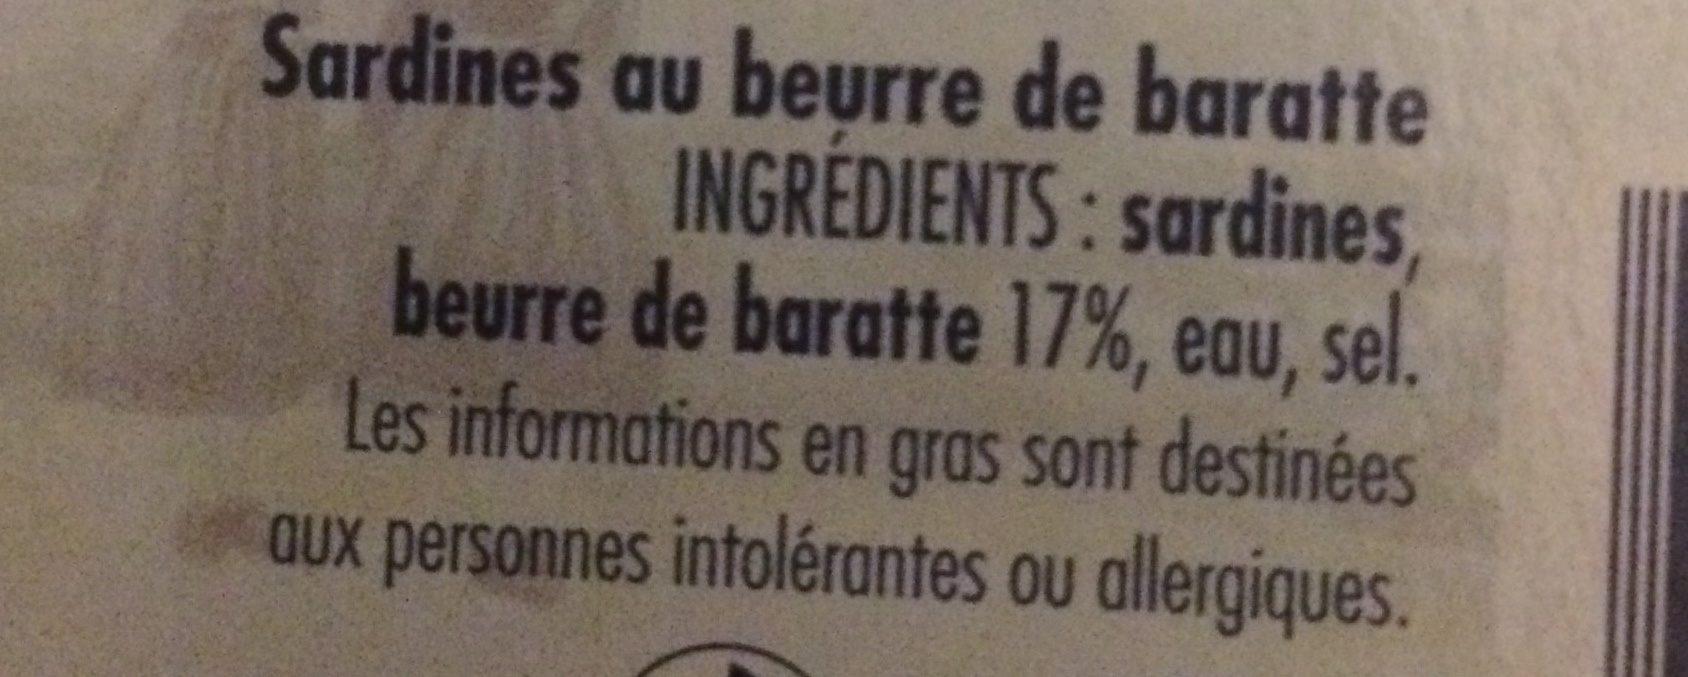 Sardine a poeler - Ingredients